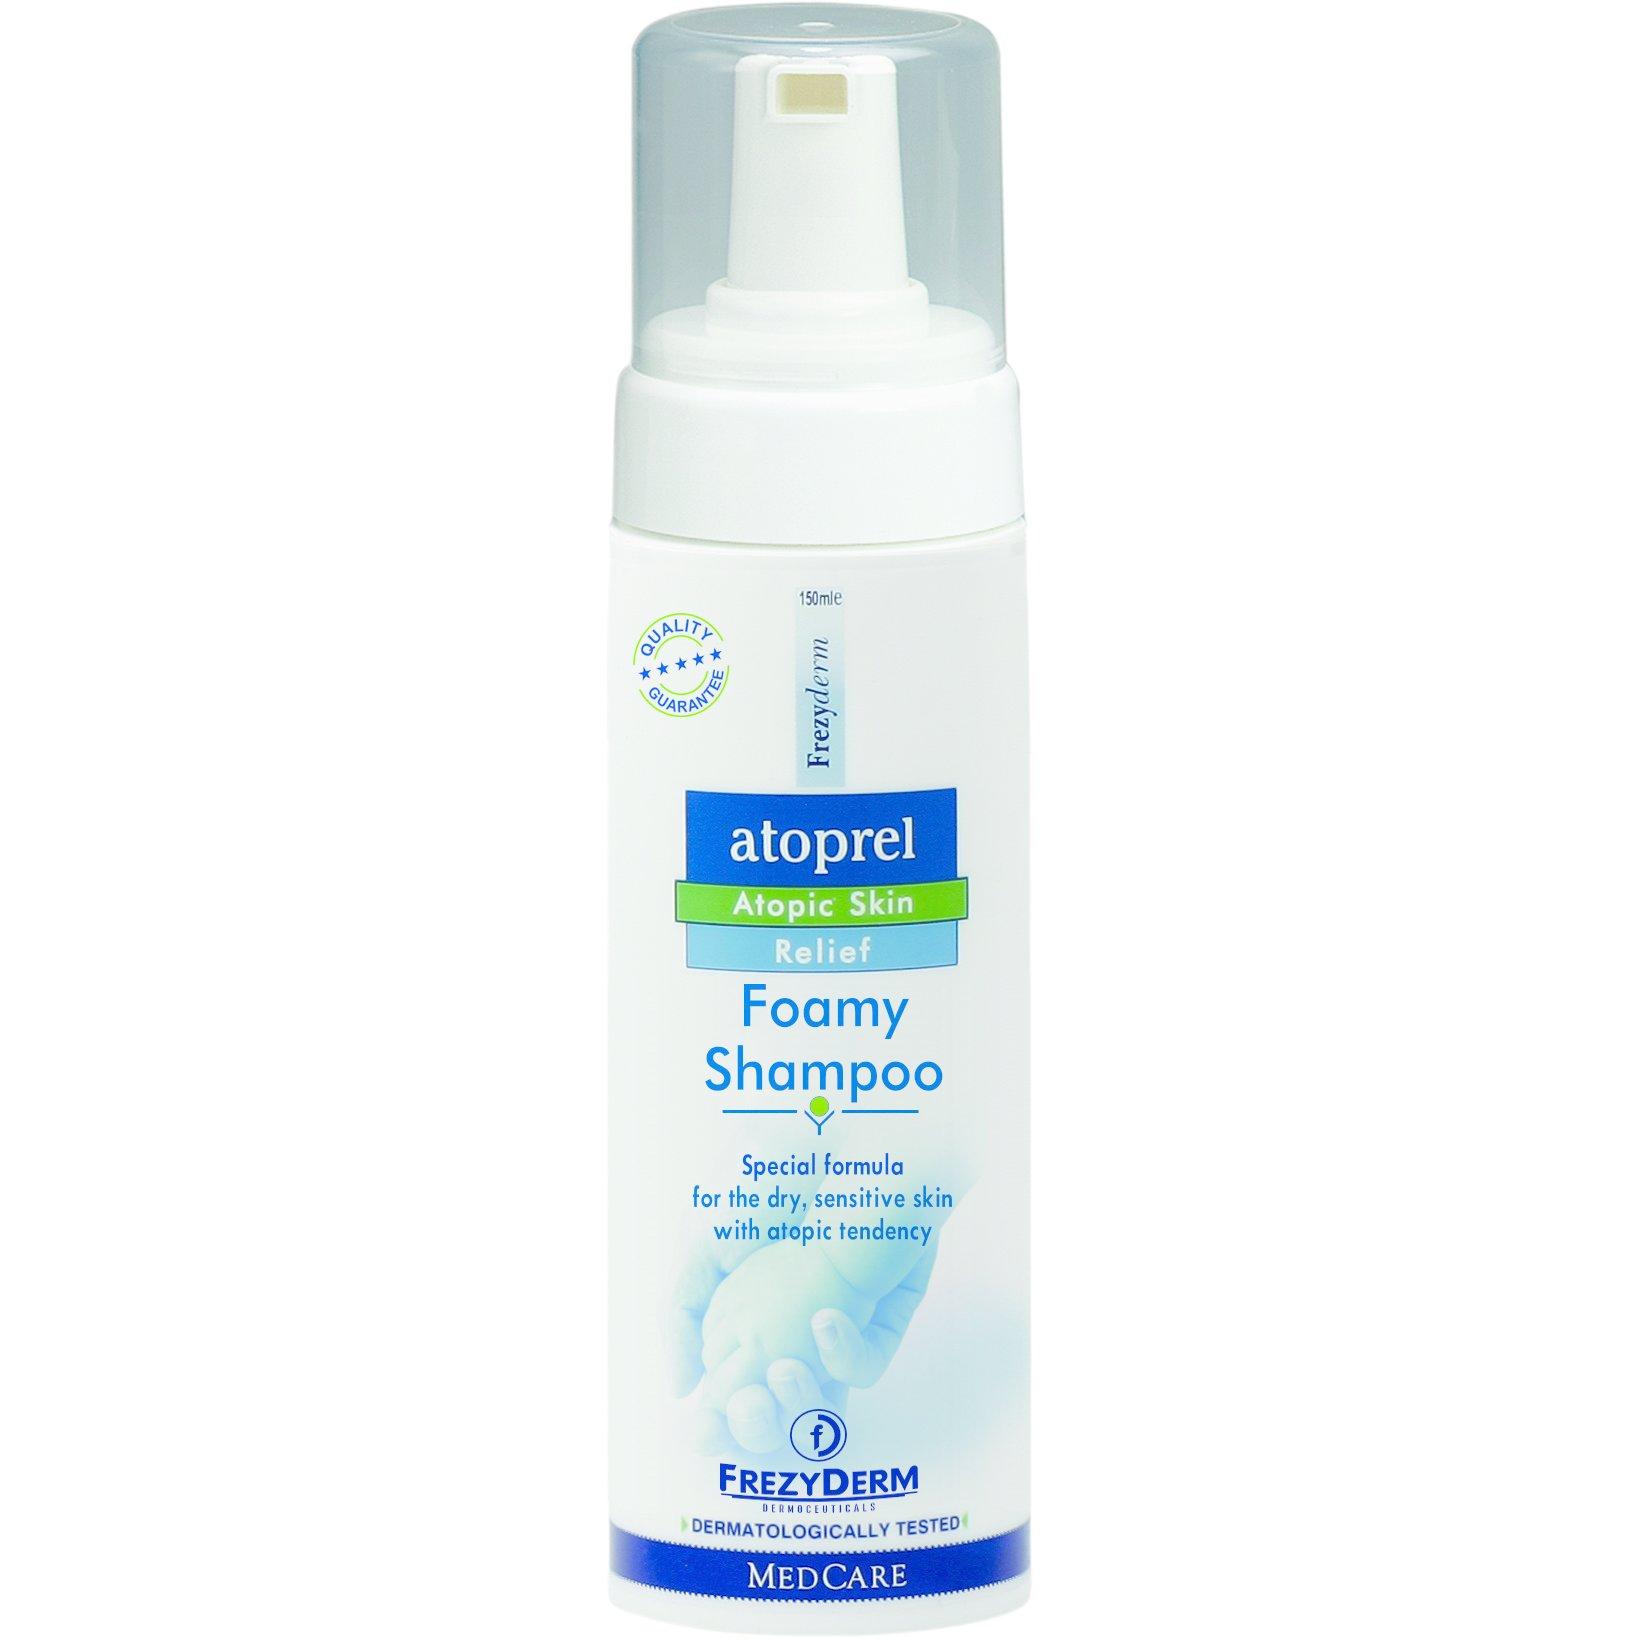 Frezyderm Atoprel Foamy Shampoo Ειδικό Σαμπουάν σε Μορφή Αφρού για Ξηρό Ευαίσθητο με Ατοπική Προδιάθεση Δέρμα 150ml